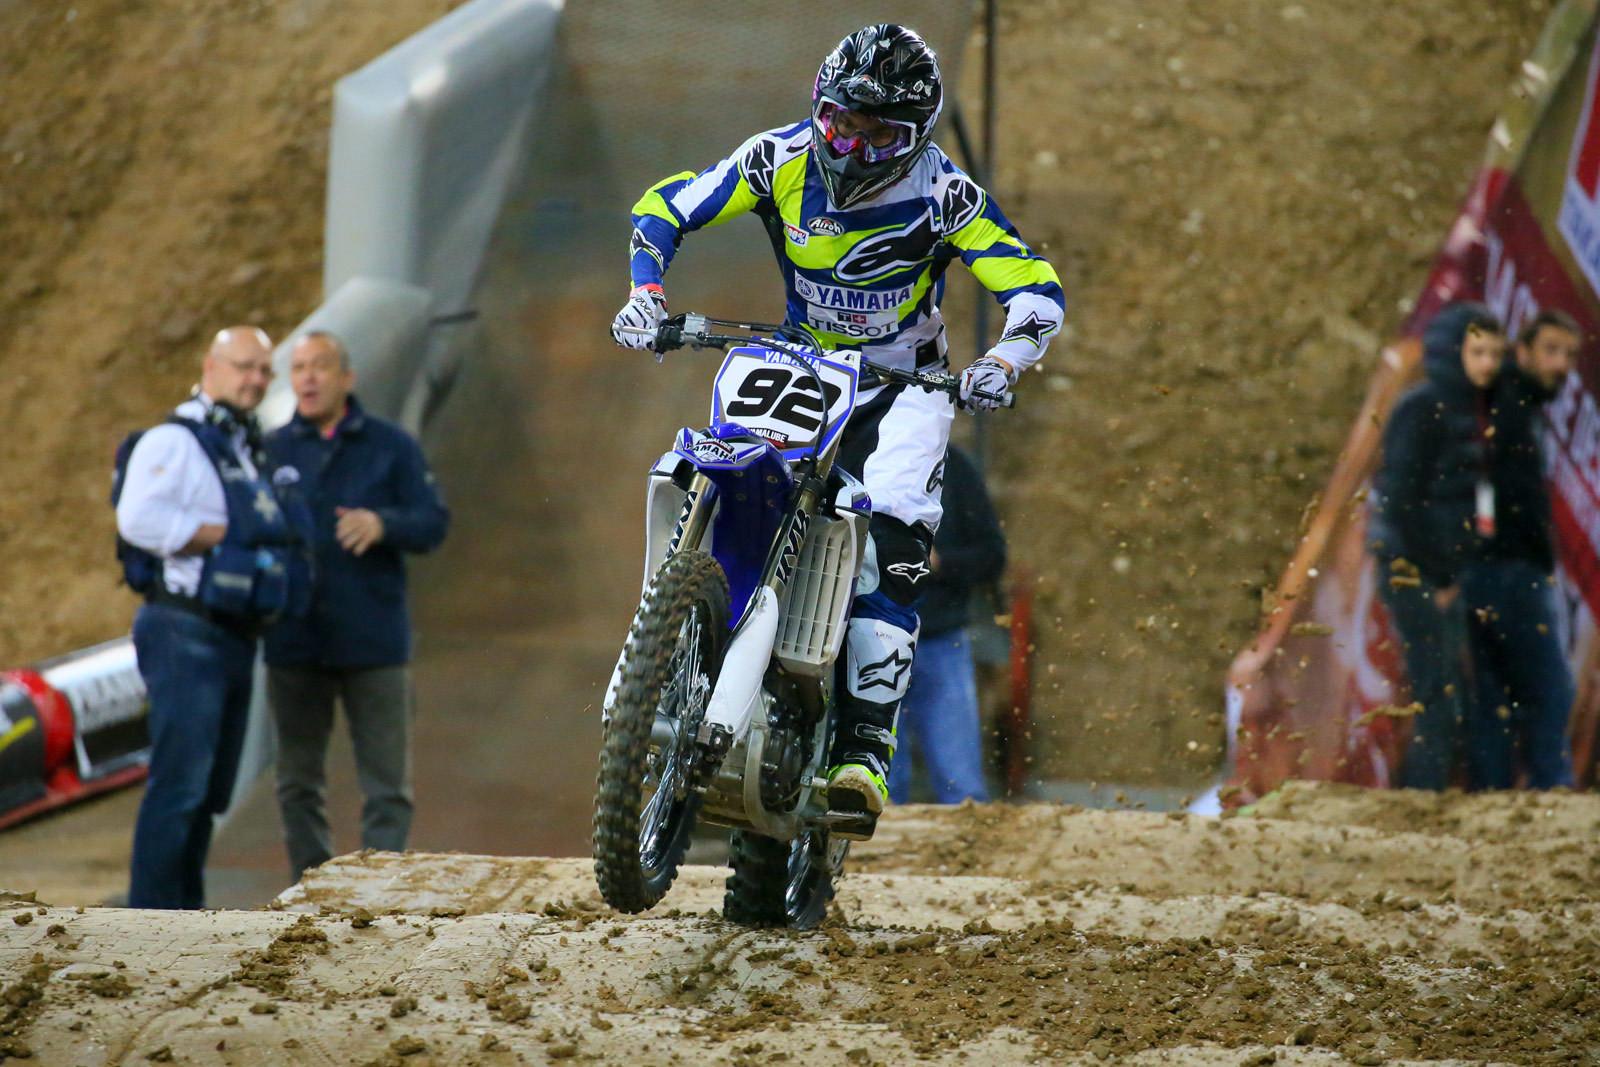 Valentin Guillod - Supercross Paris-Lille: Press Day - Motocross Pictures - Vital MX